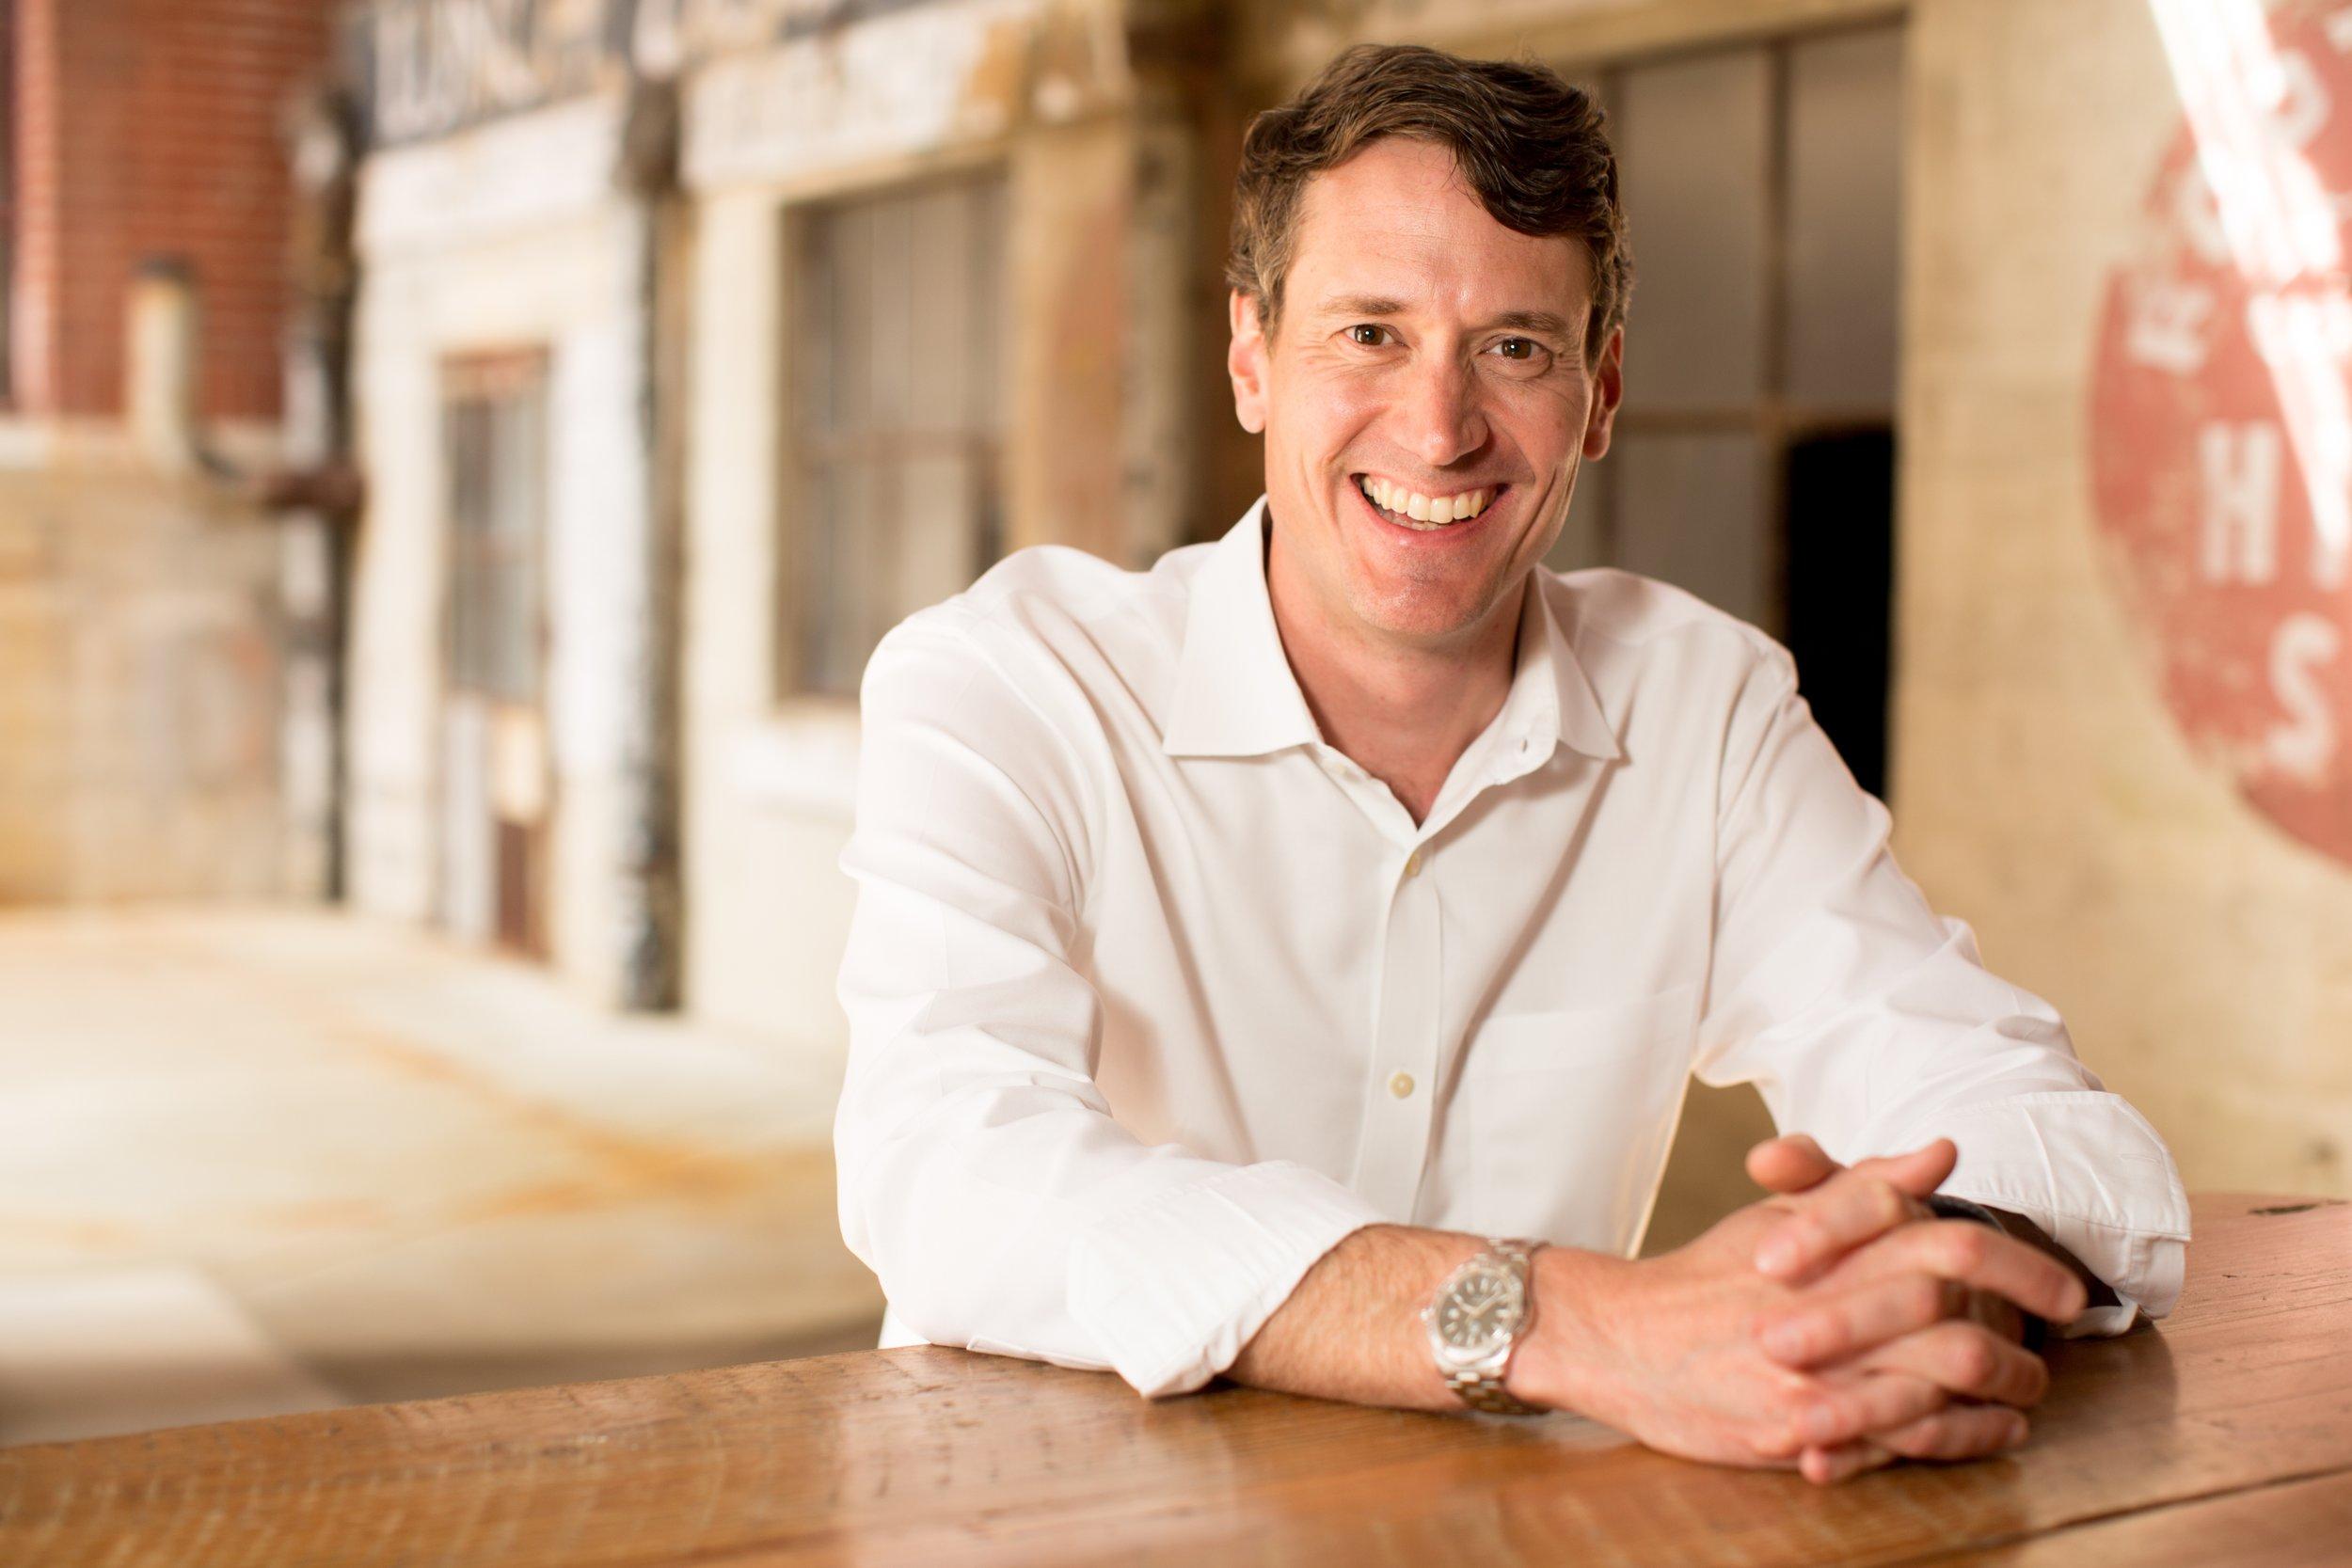 <b>Todd Barr</b><br>Sr. Director of Digital Demand, Red Hat